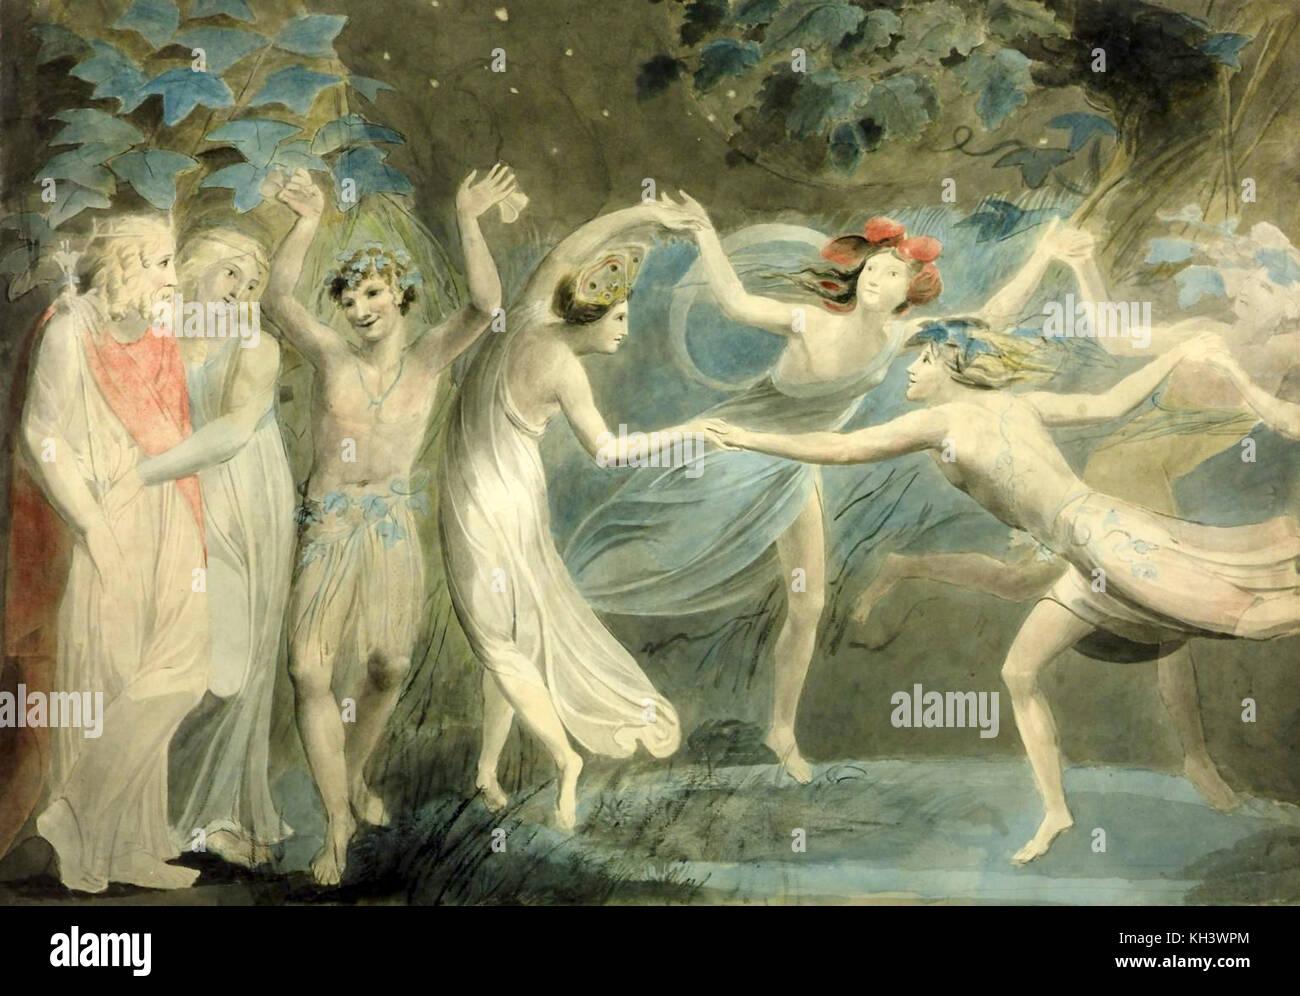 Oberon, Titania and Puck with Fairies Dancing circa 1786, William Blake - Stock Image